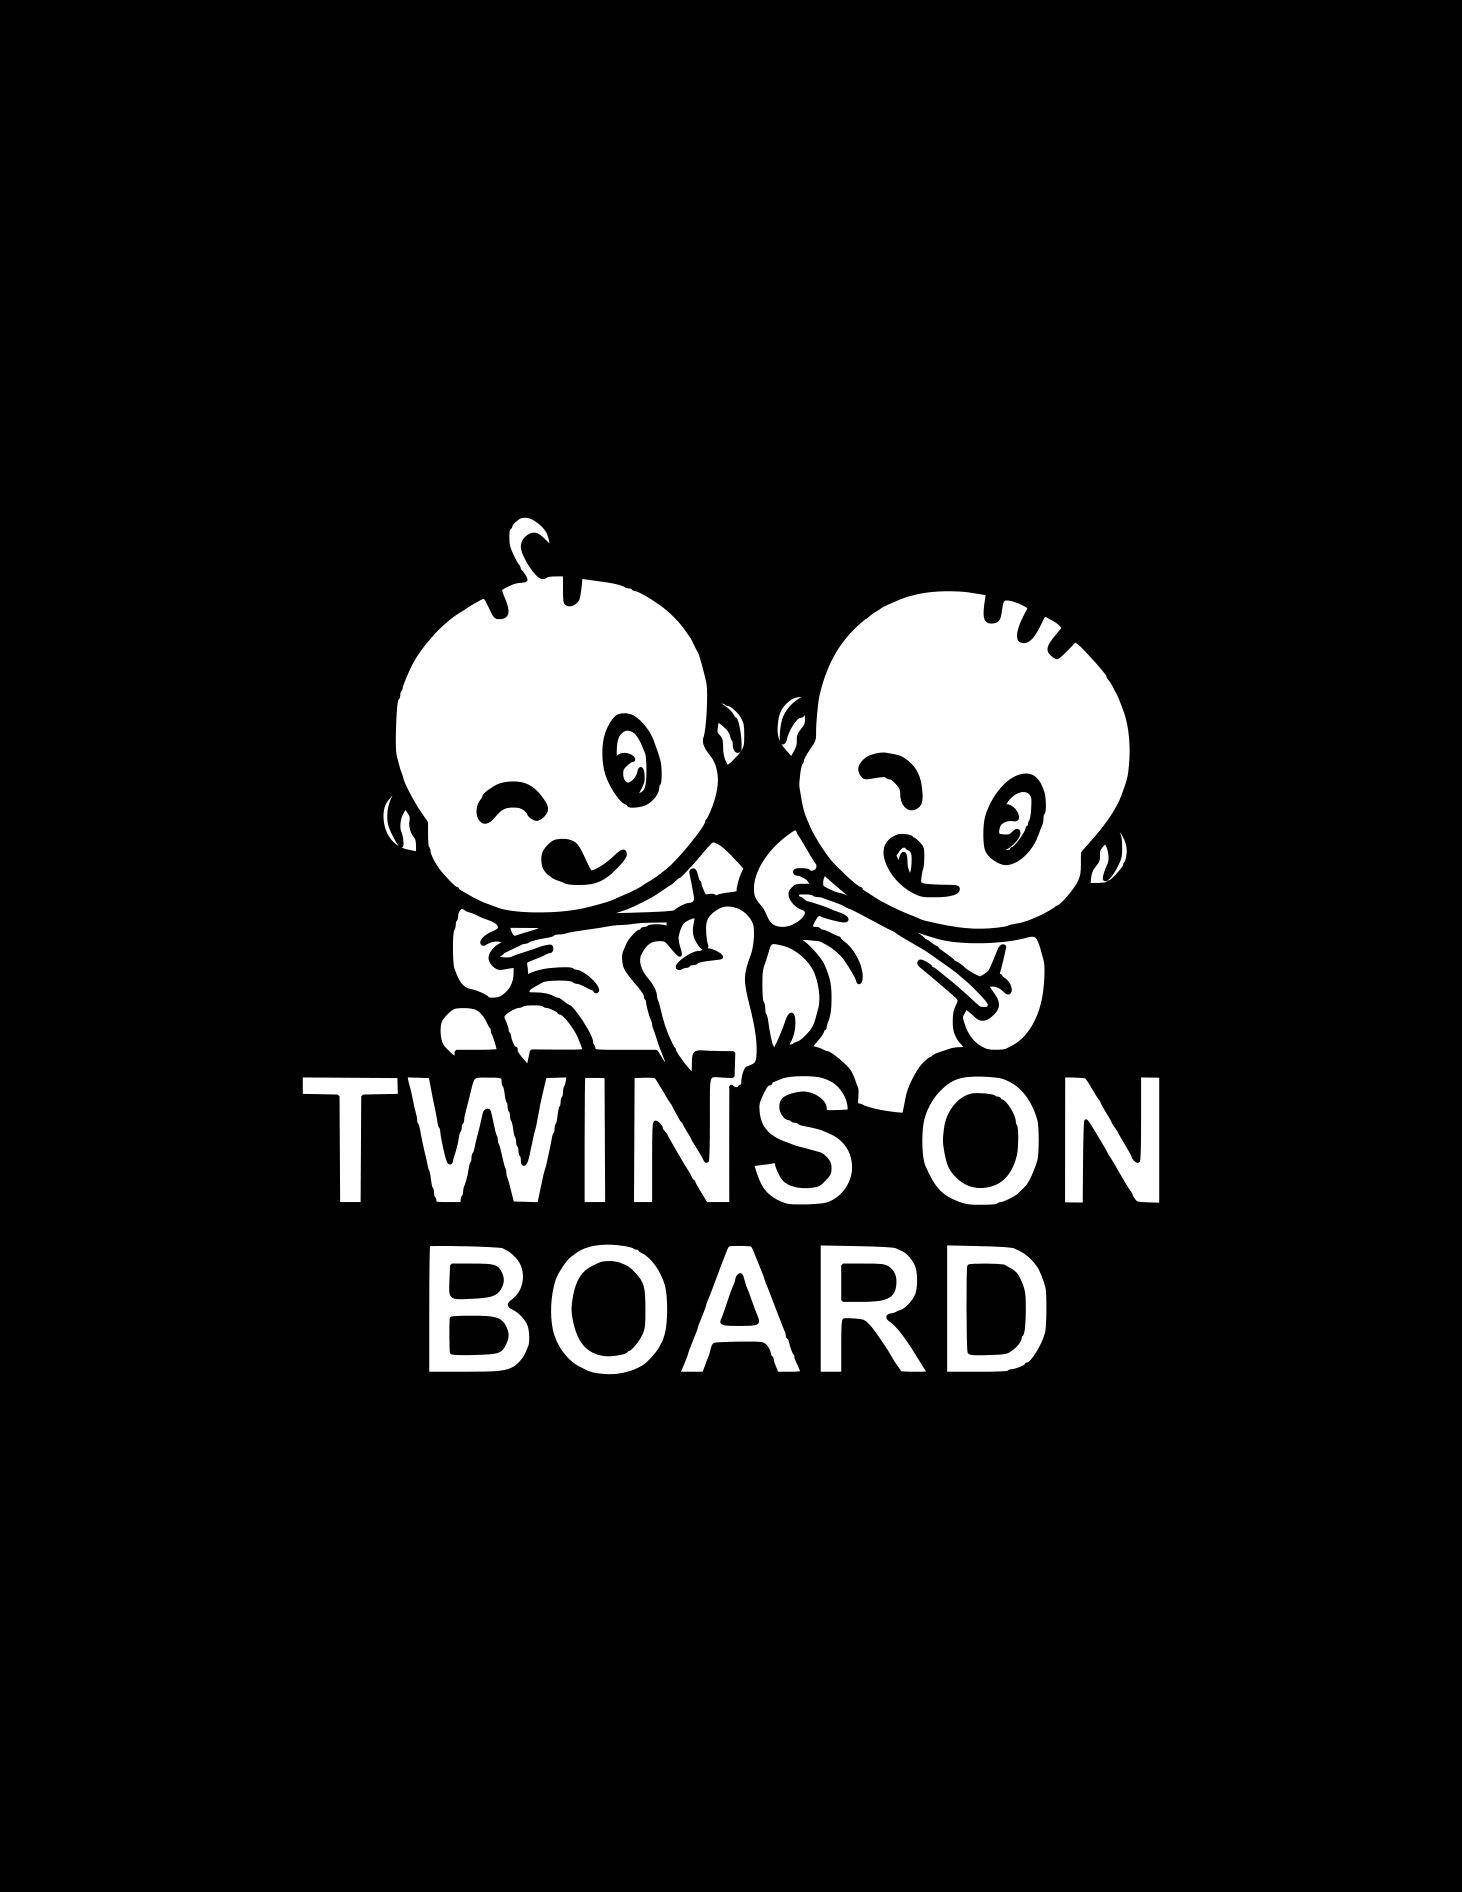 Twins On Board Decal Window Bumper Baby On Board Car Decal Laptop Cute Twins Decal Twin Babies Car Decal Baby On Boar Baby Decals Digital Word Art Lion Drawing [ 1892 x 1462 Pixel ]